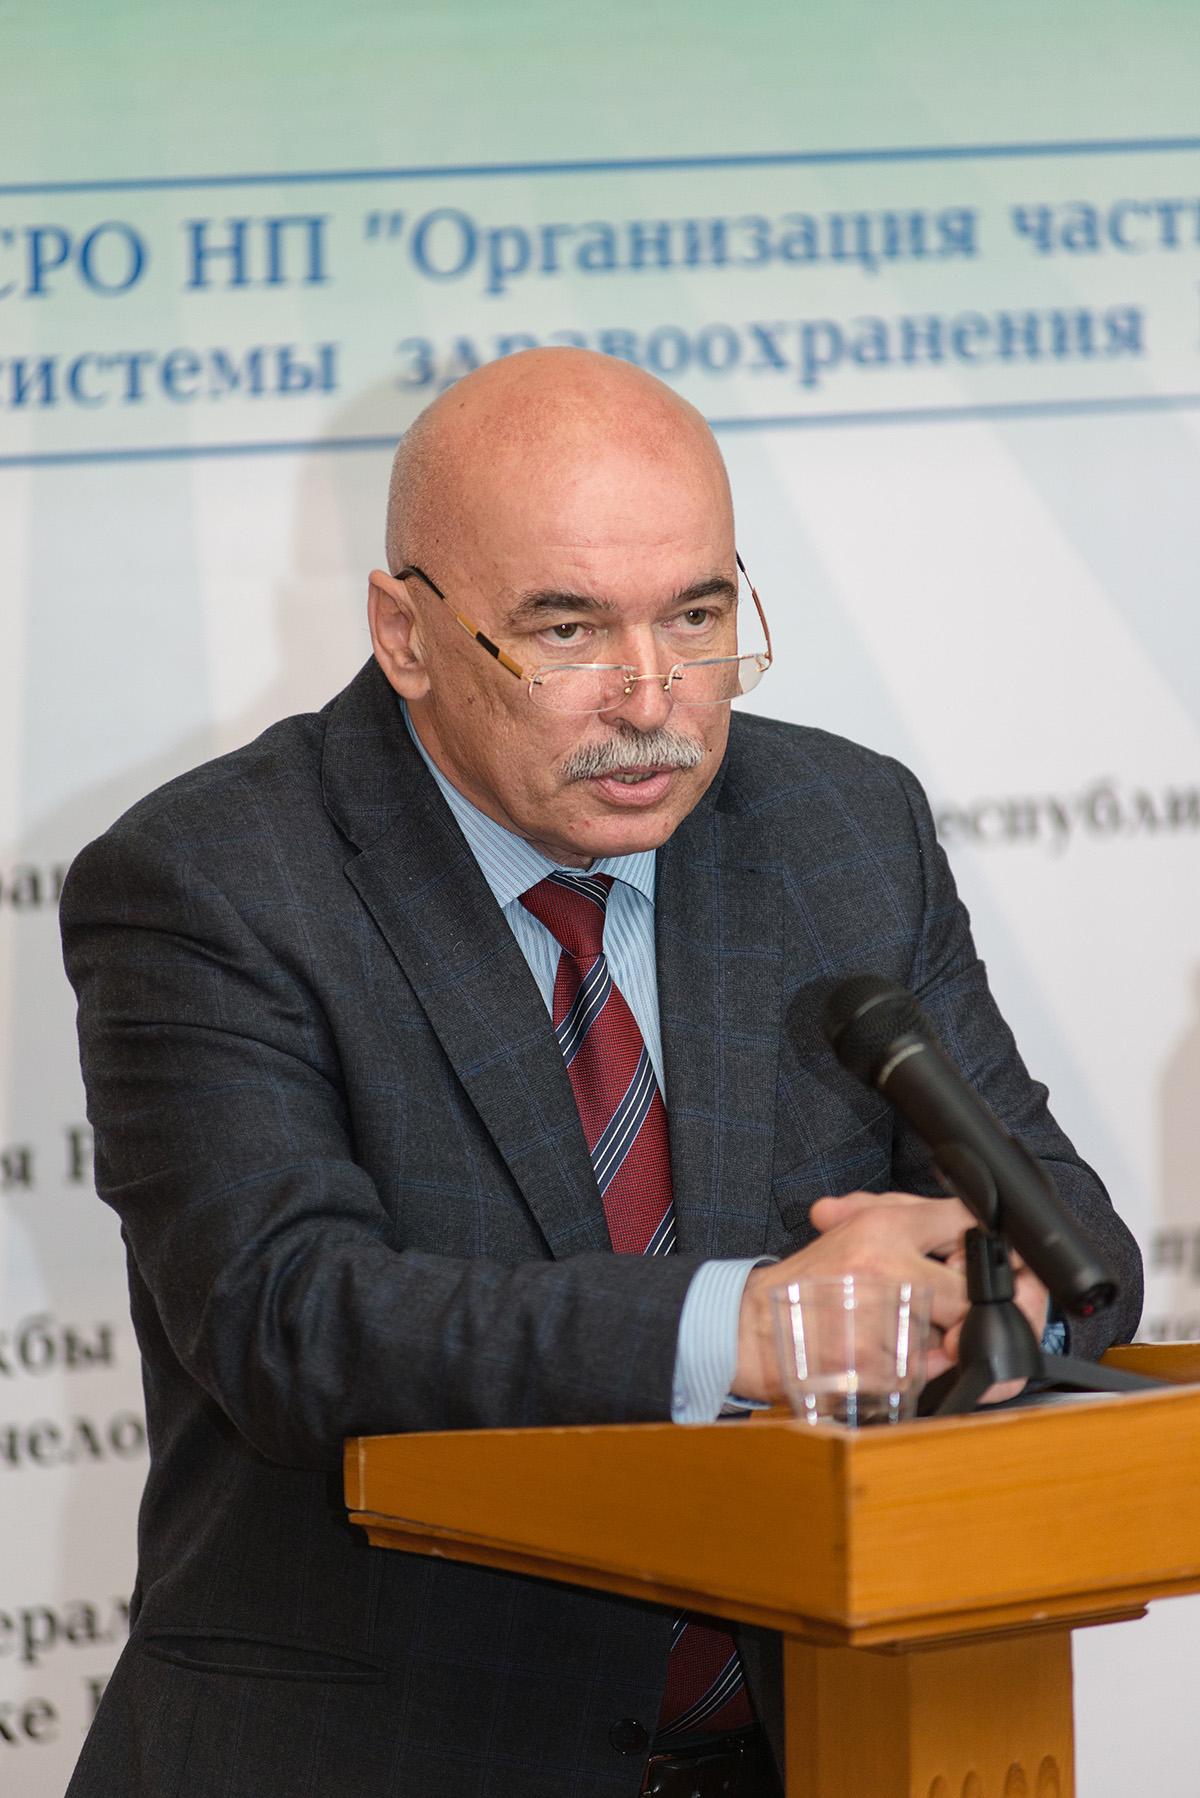 Заместитель министра здравоохранения беларуси вячеслав шило